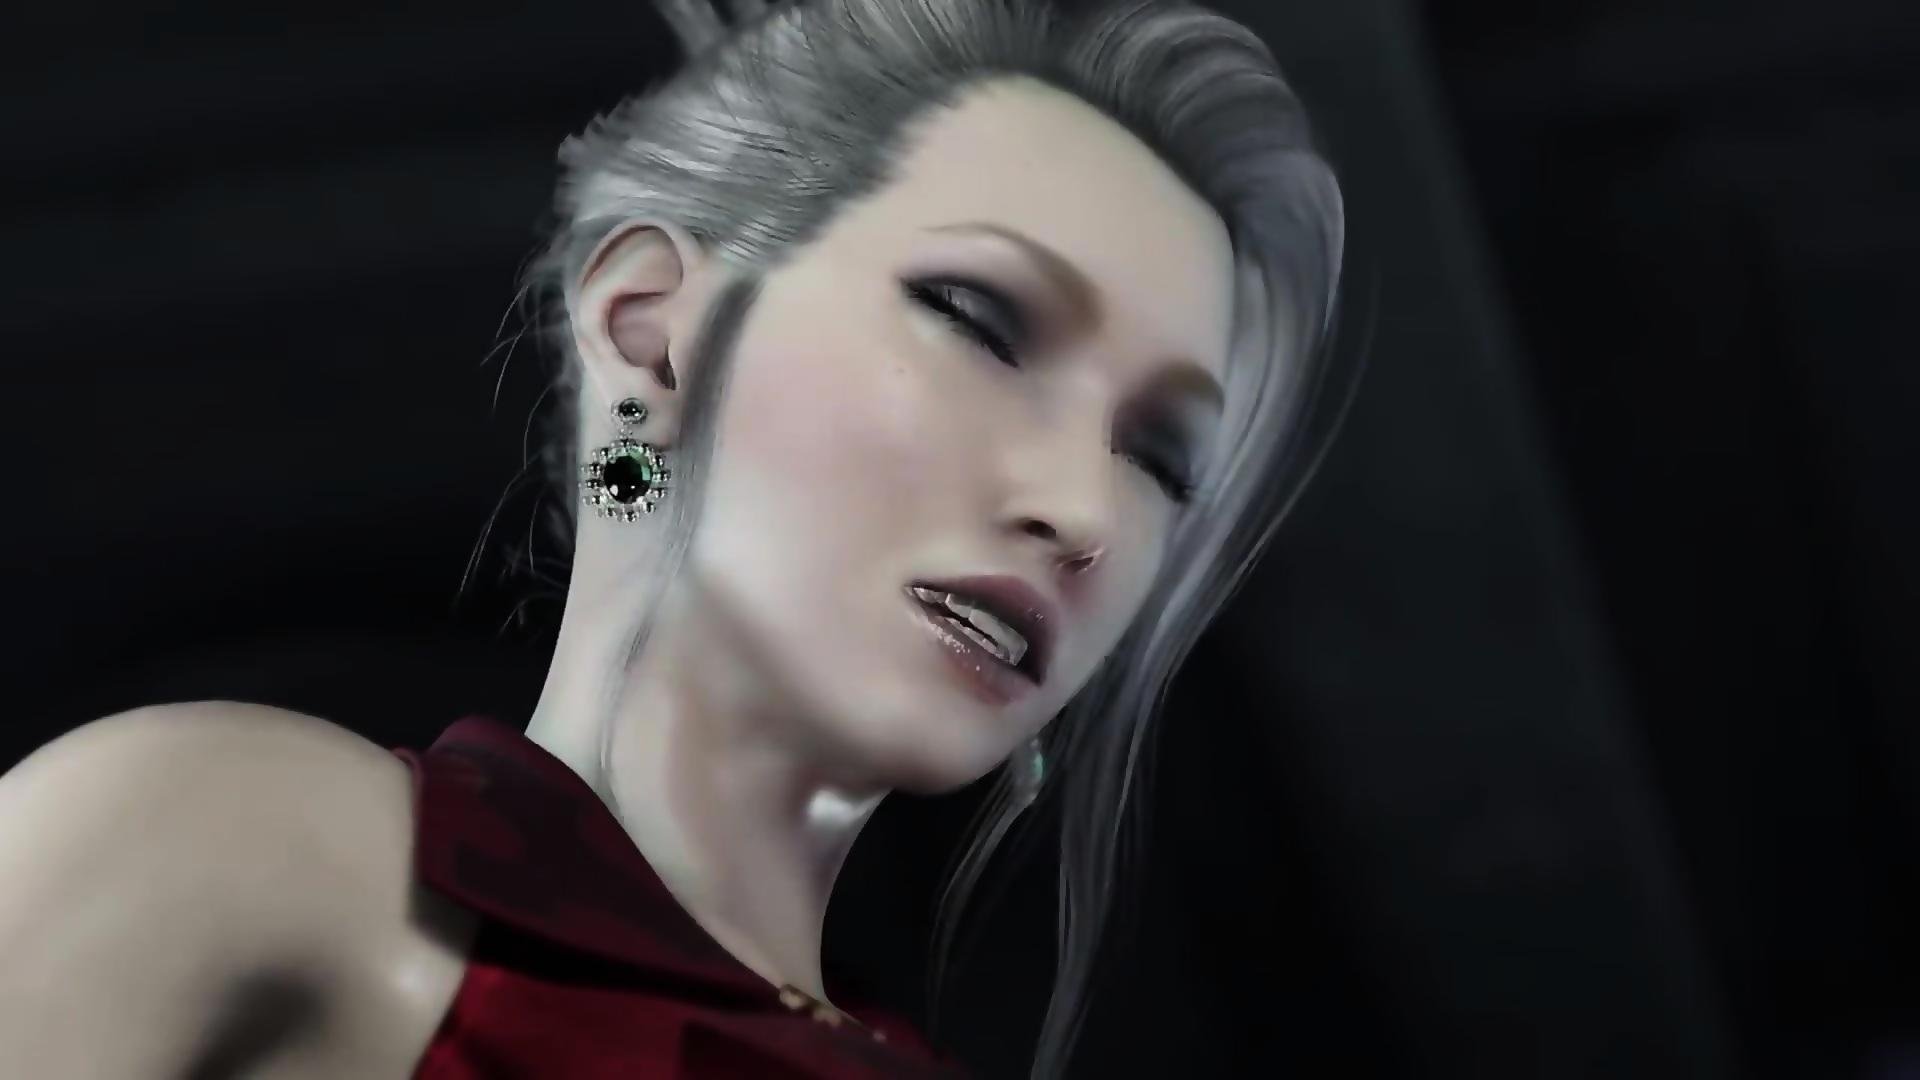 Final Fantasy Scarlet Femdom (Animation W/Sound) - EPORNER